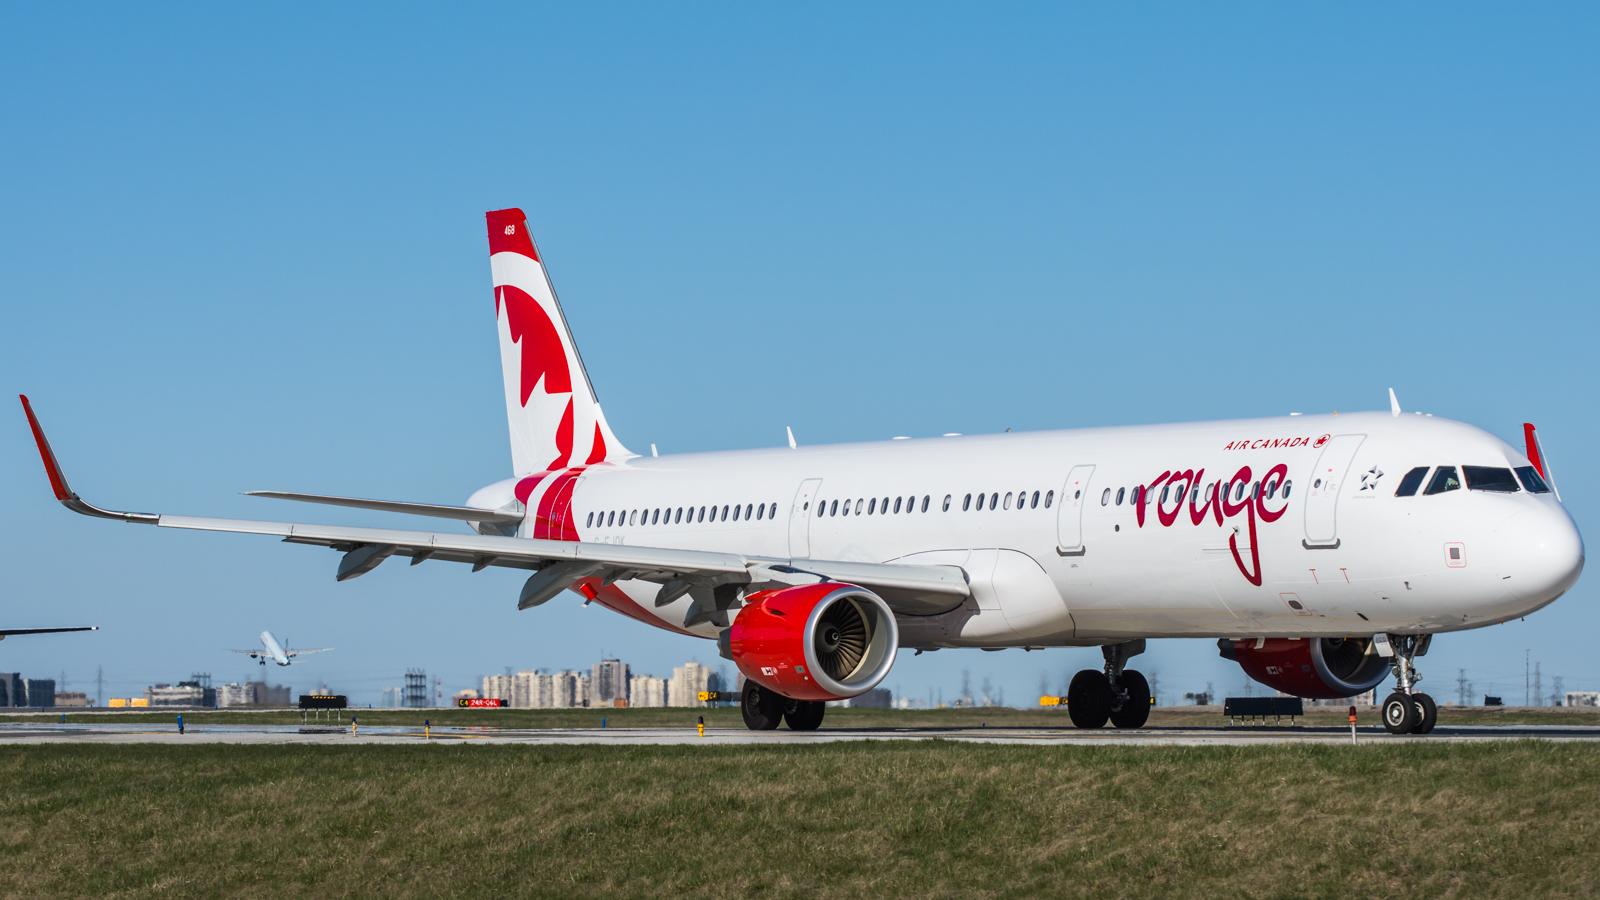 FileAir Canada Rouge Airbus A321 at Pearson Airportjpg 1600x900